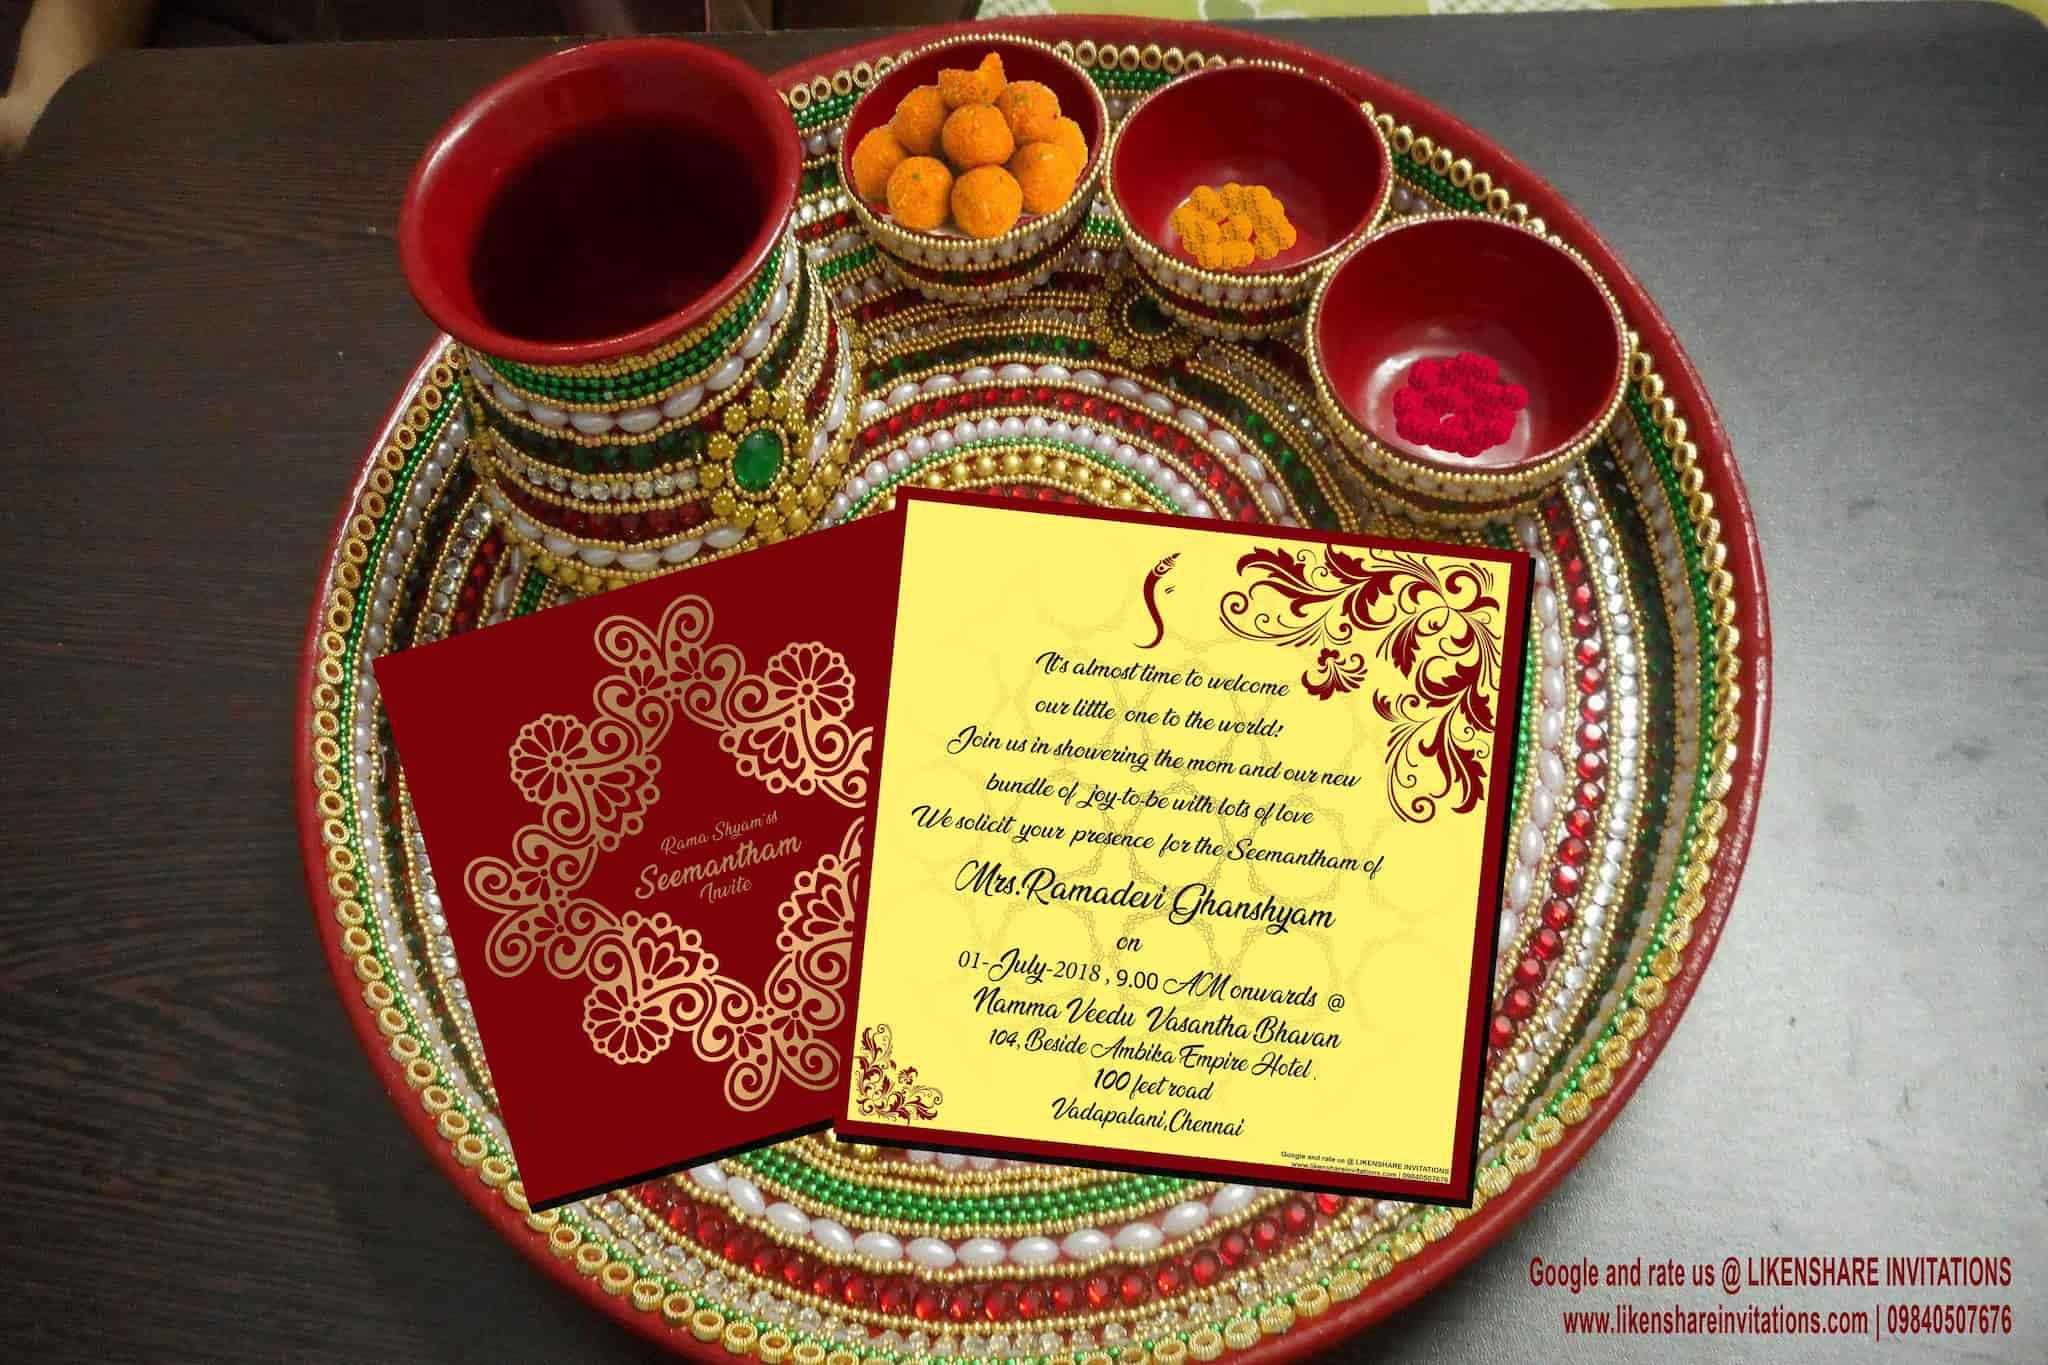 Likenshare Invitations Villivakkam Wedding Card Printers